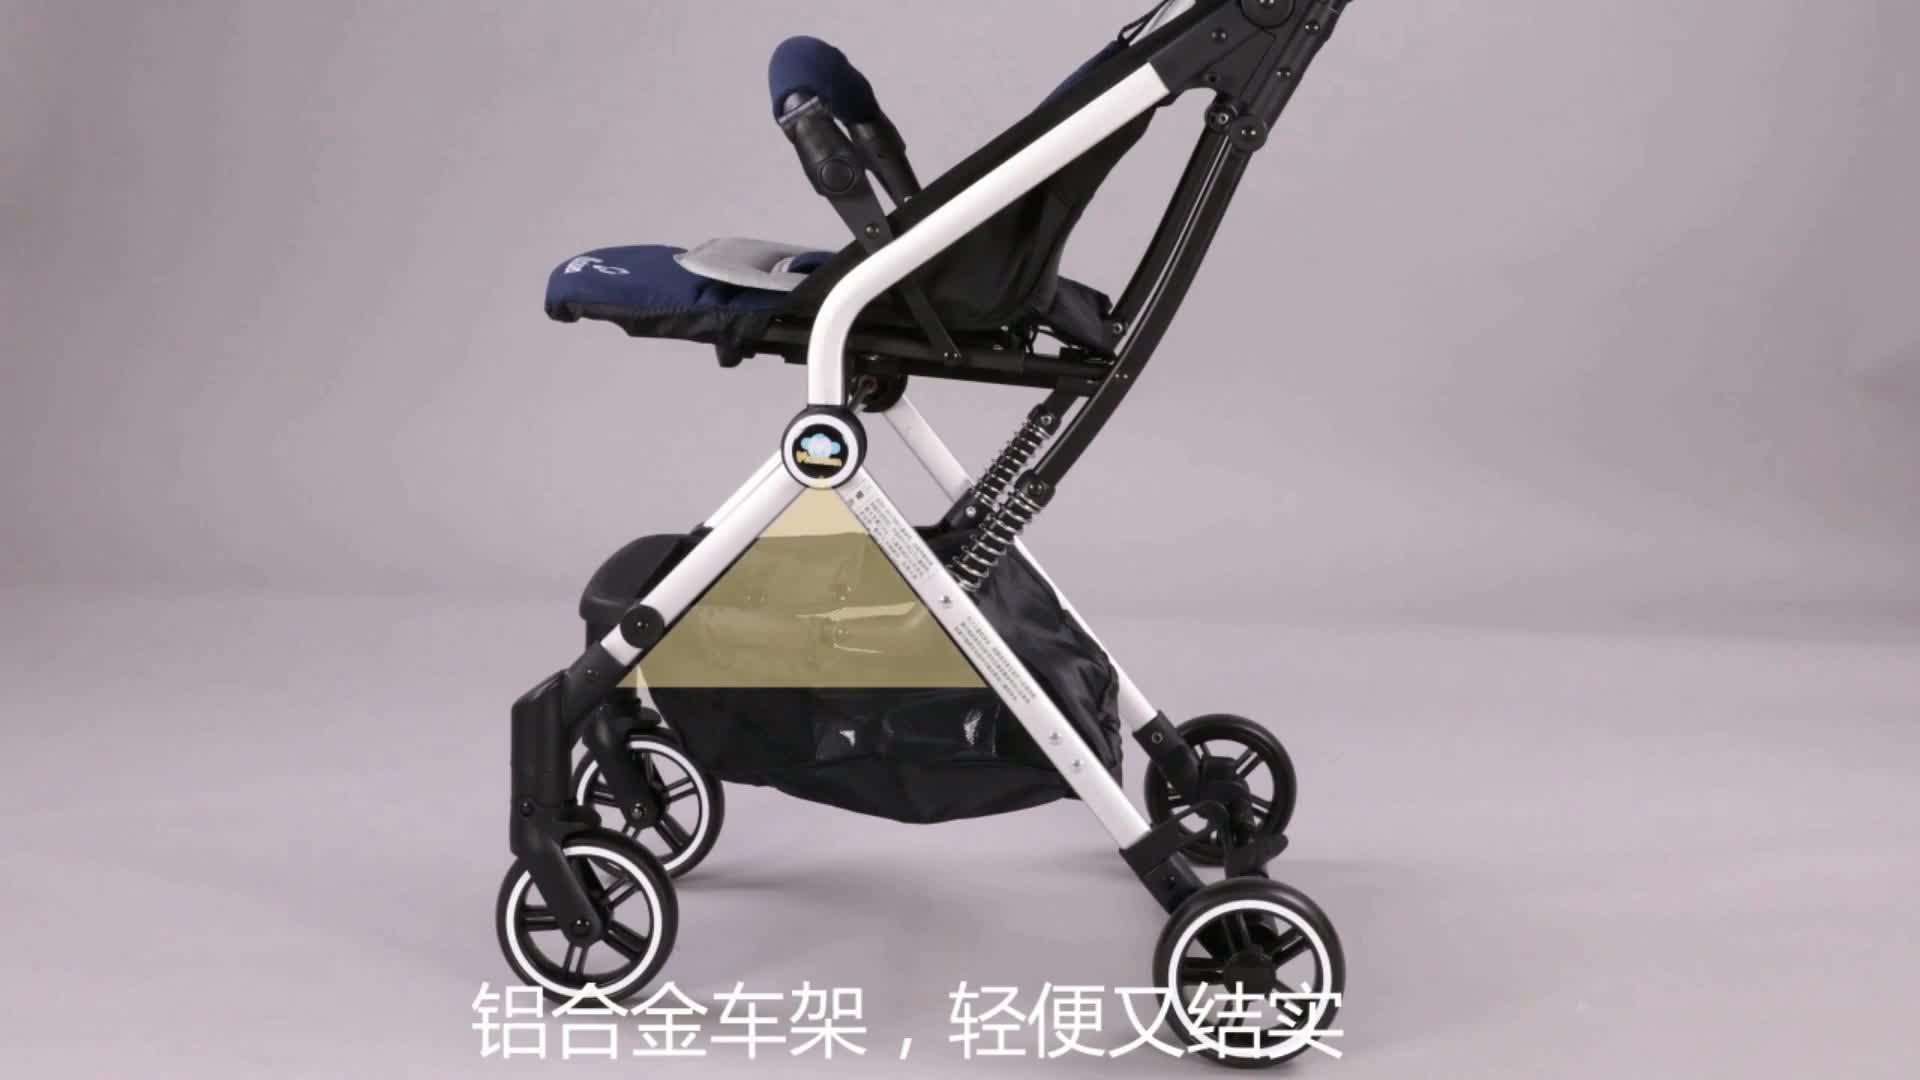 Montasen תינוק עגלת מתקפל קל משקל באגי Sktlight גבוהה נוף אלומיניום סגסוגת יושב ושוכב נסיעות עגלת